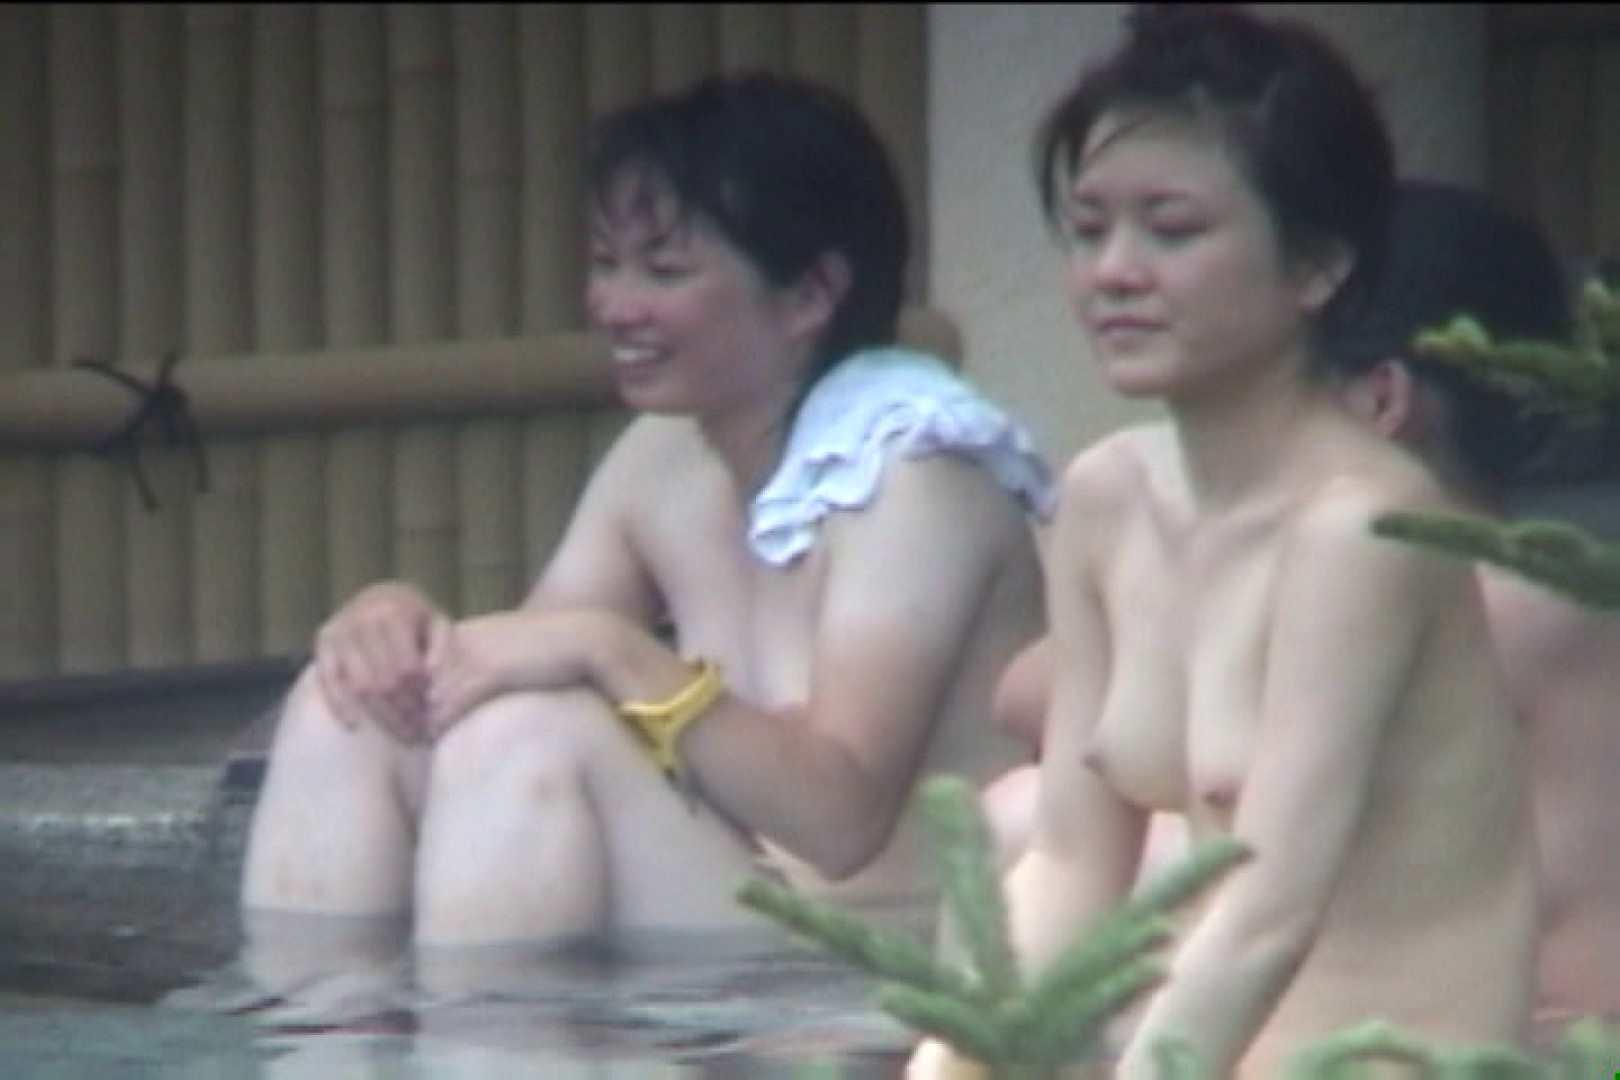 Aquaな露天風呂Vol.94【VIP限定】 露天風呂 | OLのエロ生活  20連発 1